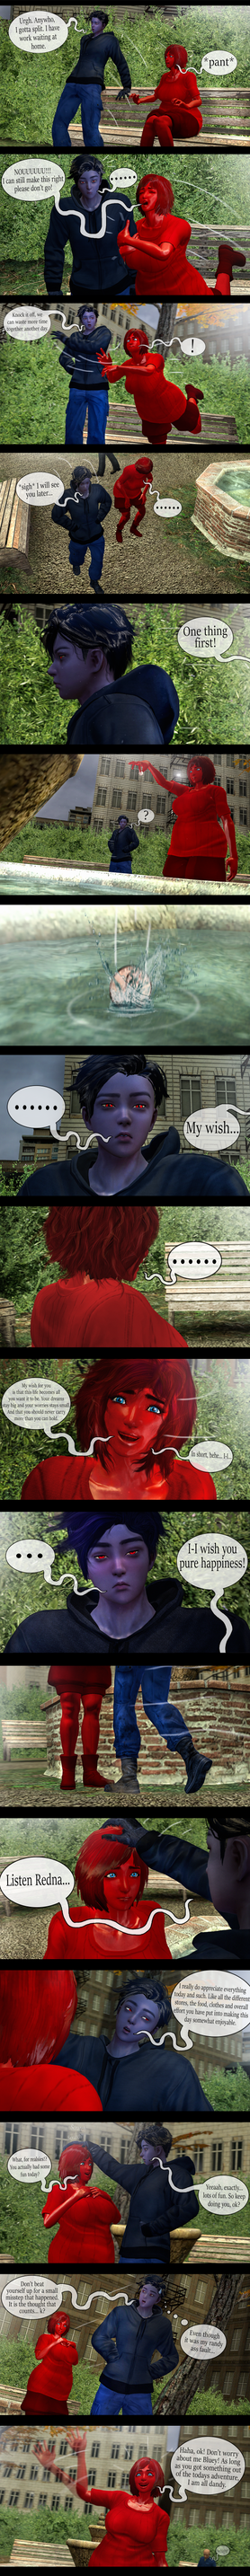 Rosing Violet - Arc 1 - Page 11 by LemurfotArt